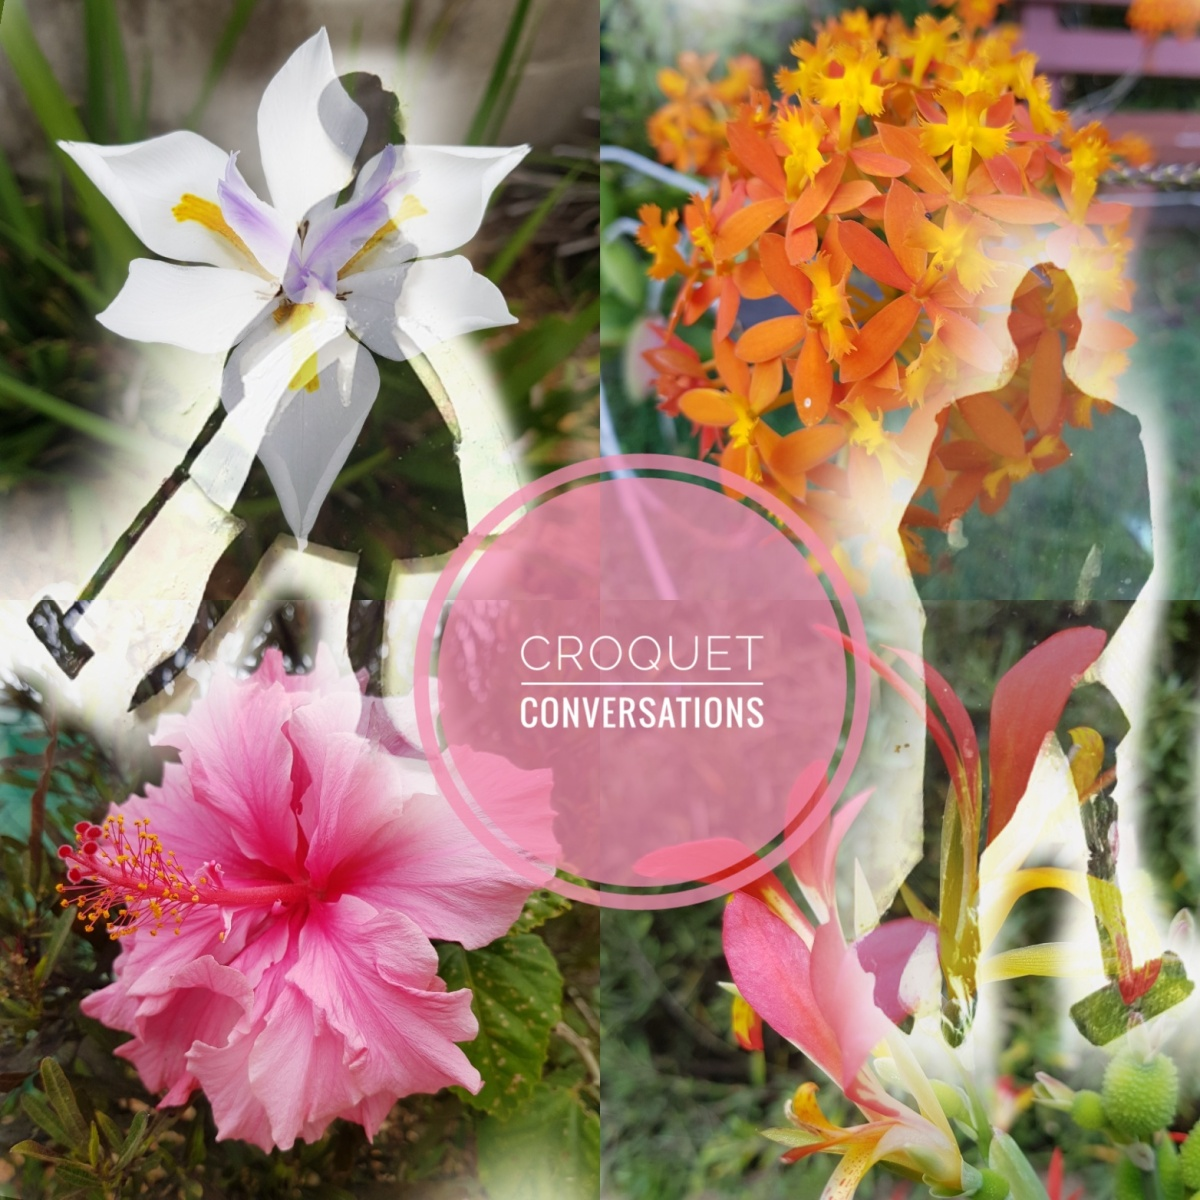 Croquet conversations